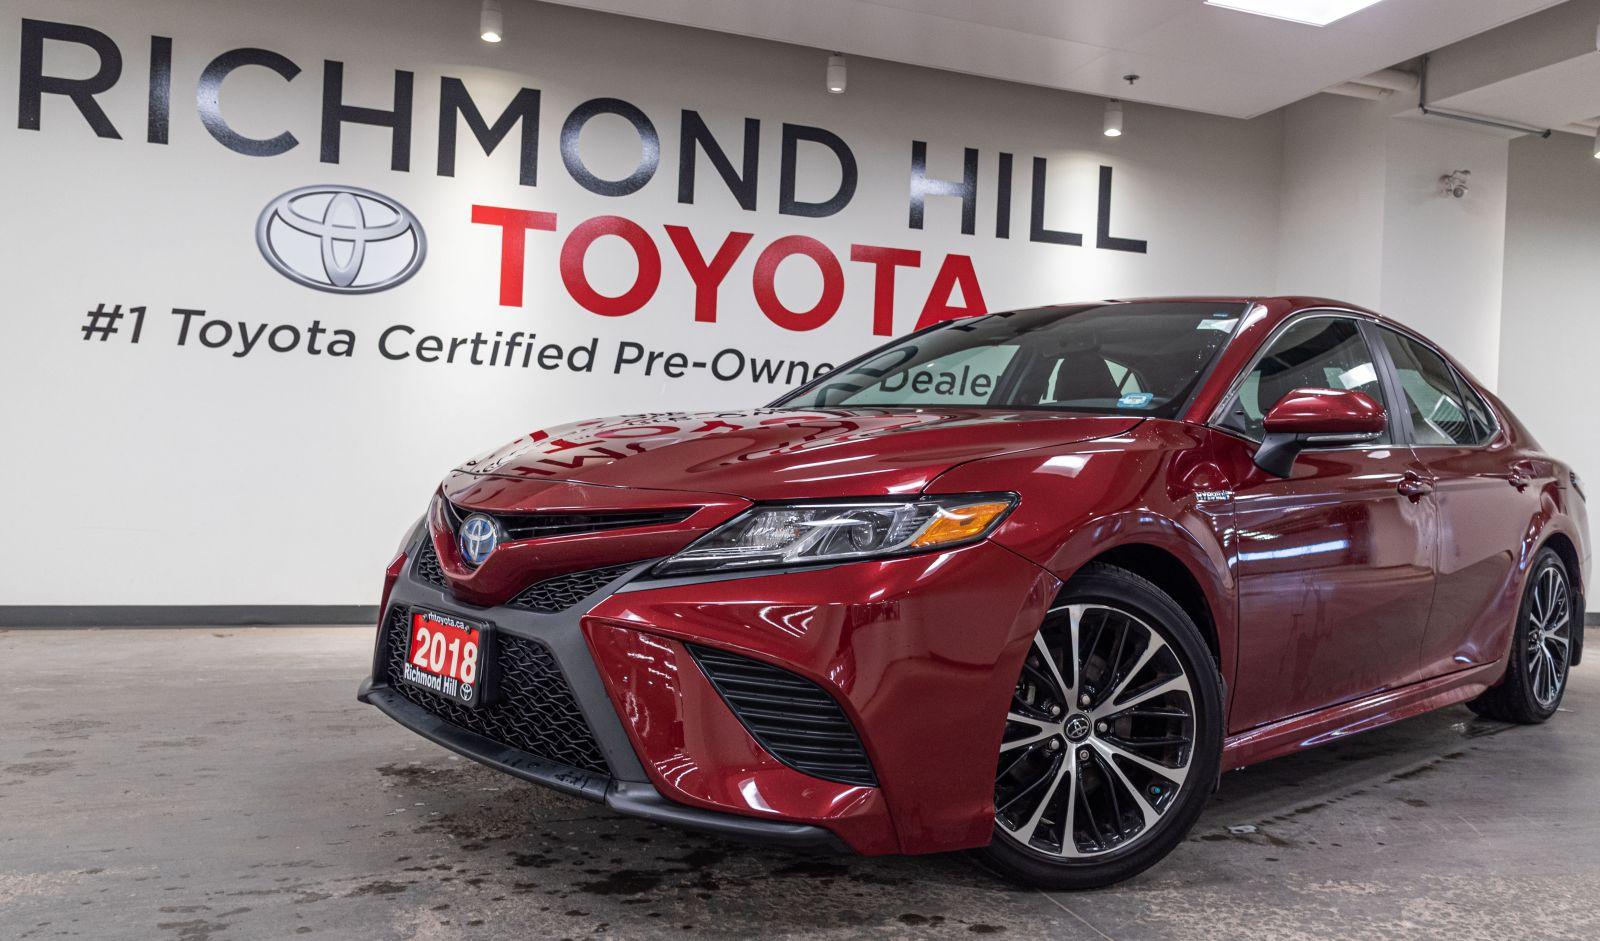 2018 Toyota Camry Hybrid Image